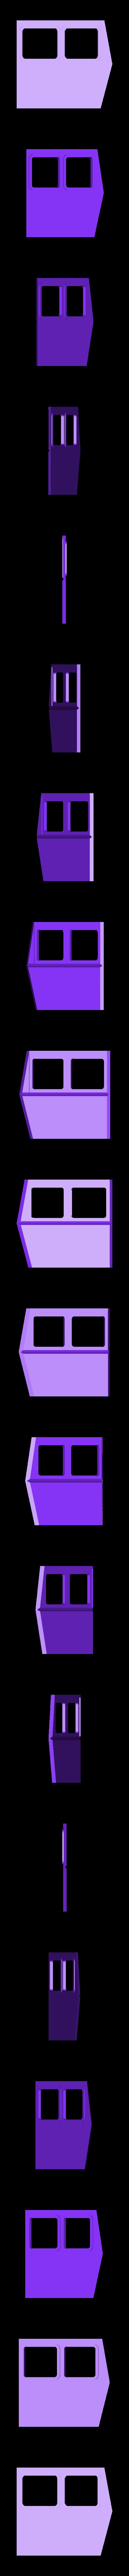 G lateral2 cabine.STL Download STL file Draisine Matisa for LGB • 3D printable object, biddle